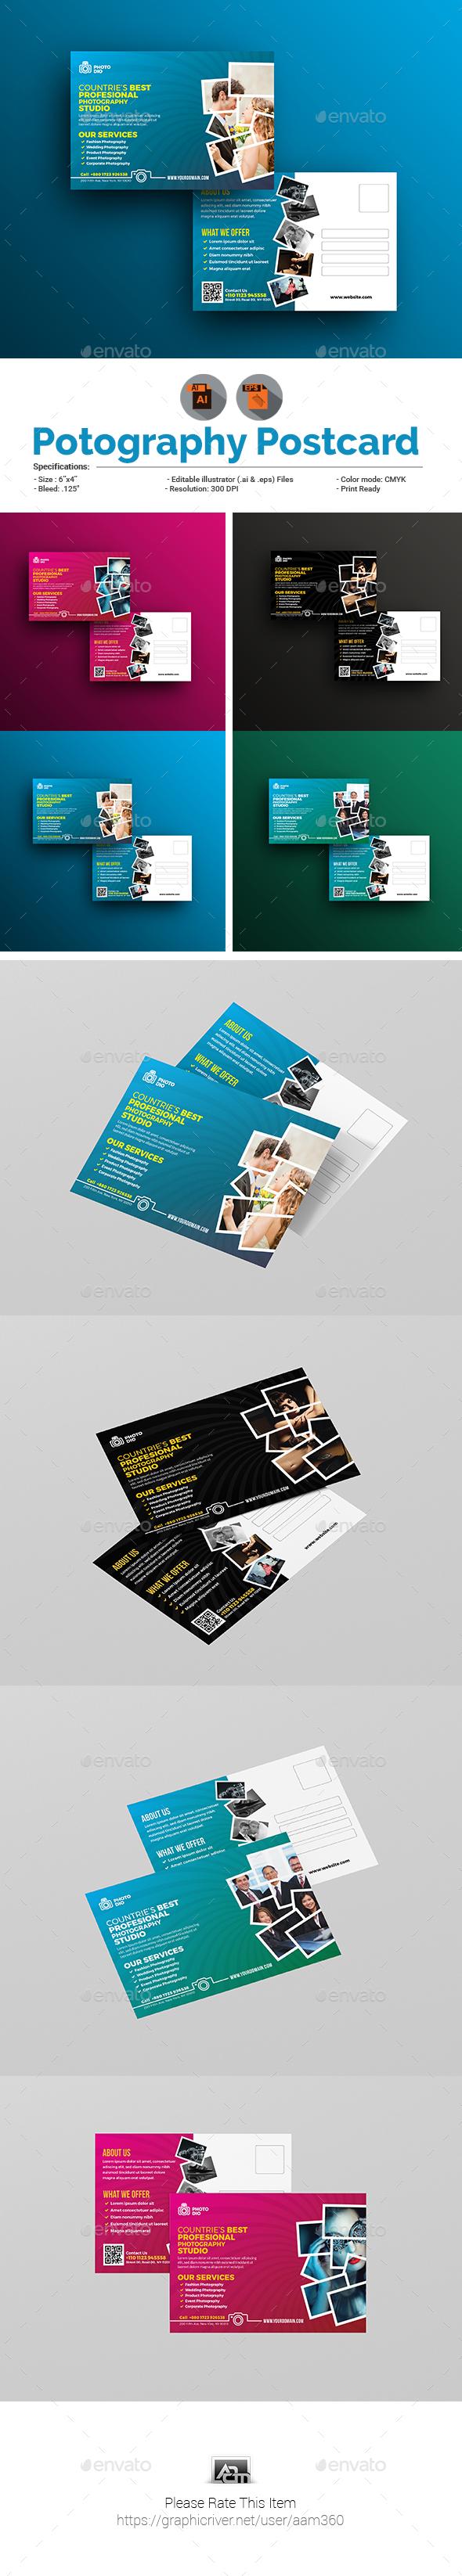 Photography/Photo Studio Postcard Template - Cards & Invites Print Templates